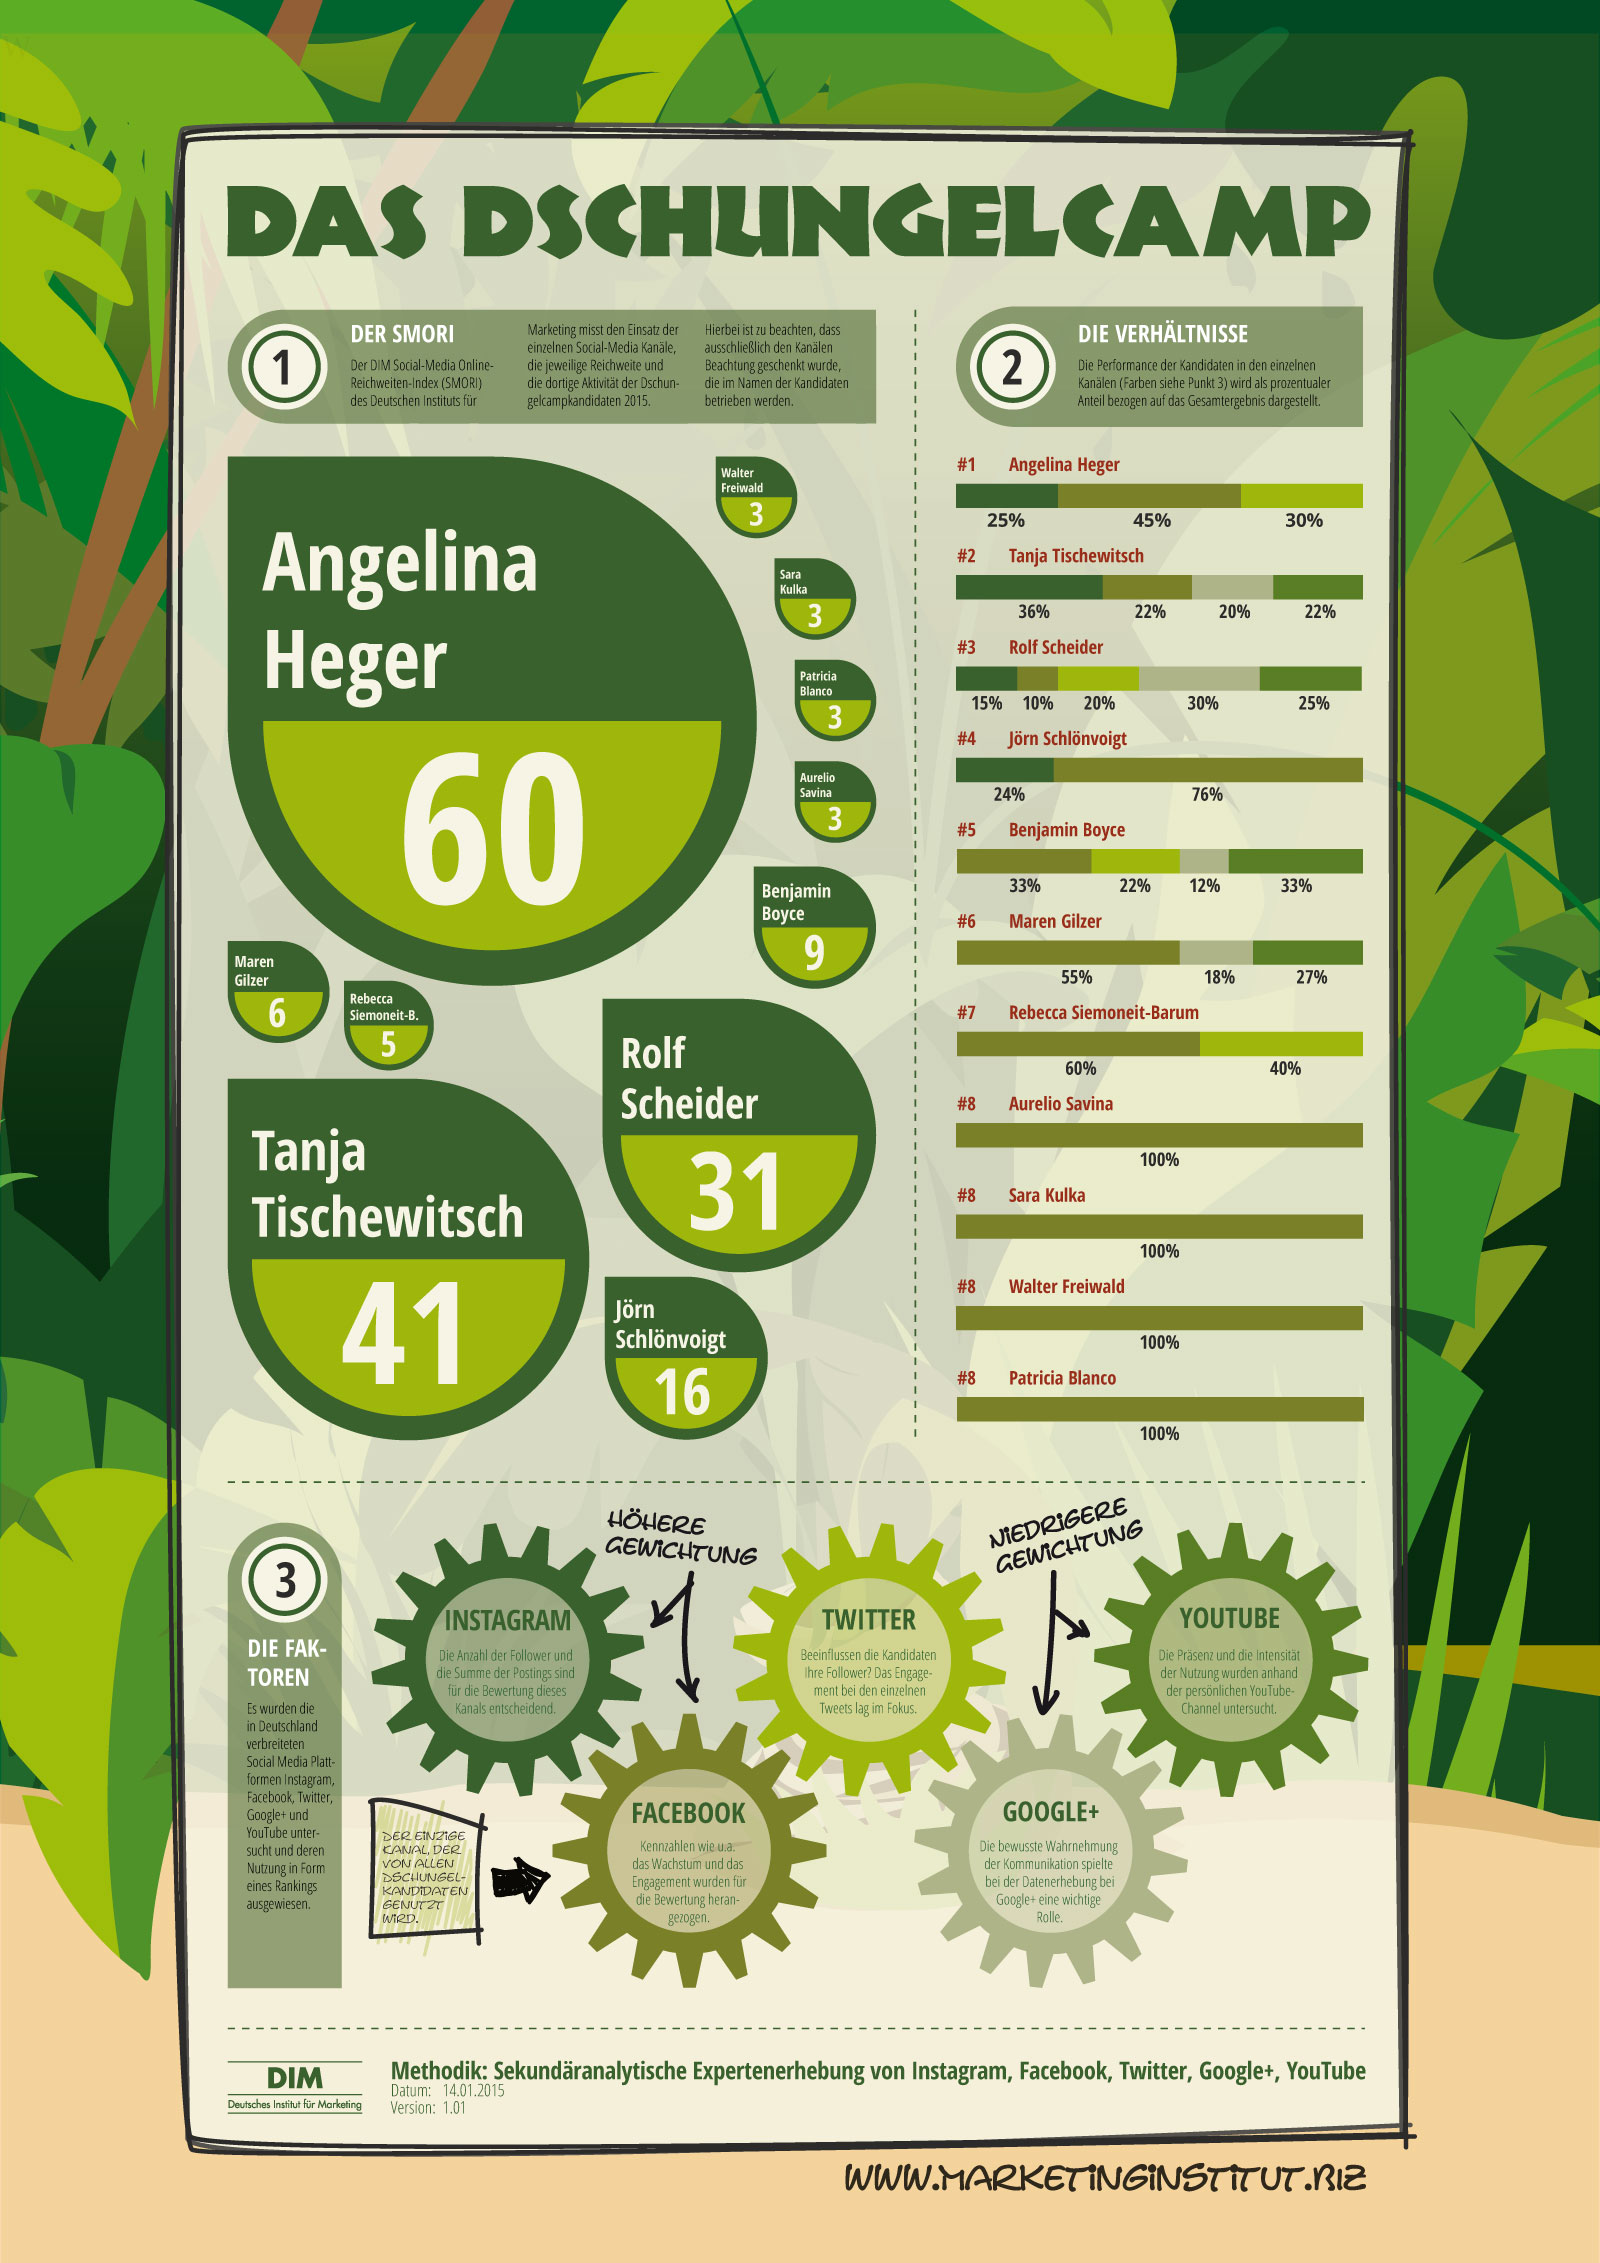 Angelina Heger Dschungelcamp 2015 Kandidatin SMORI Social Media